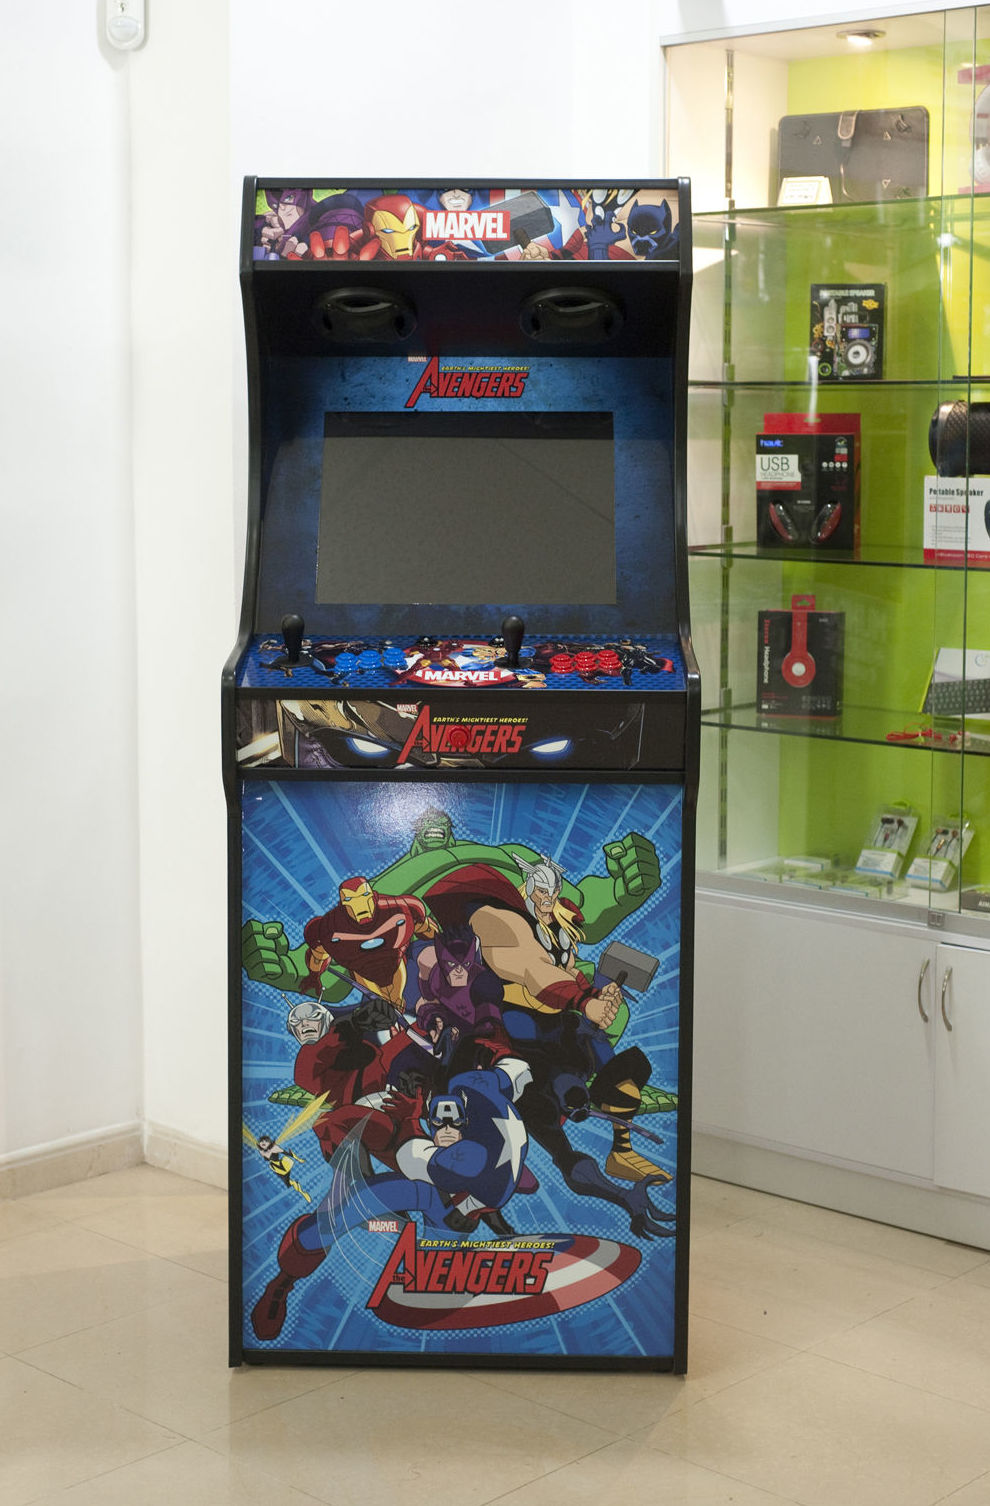 Máquina Arcade para dos jugadores